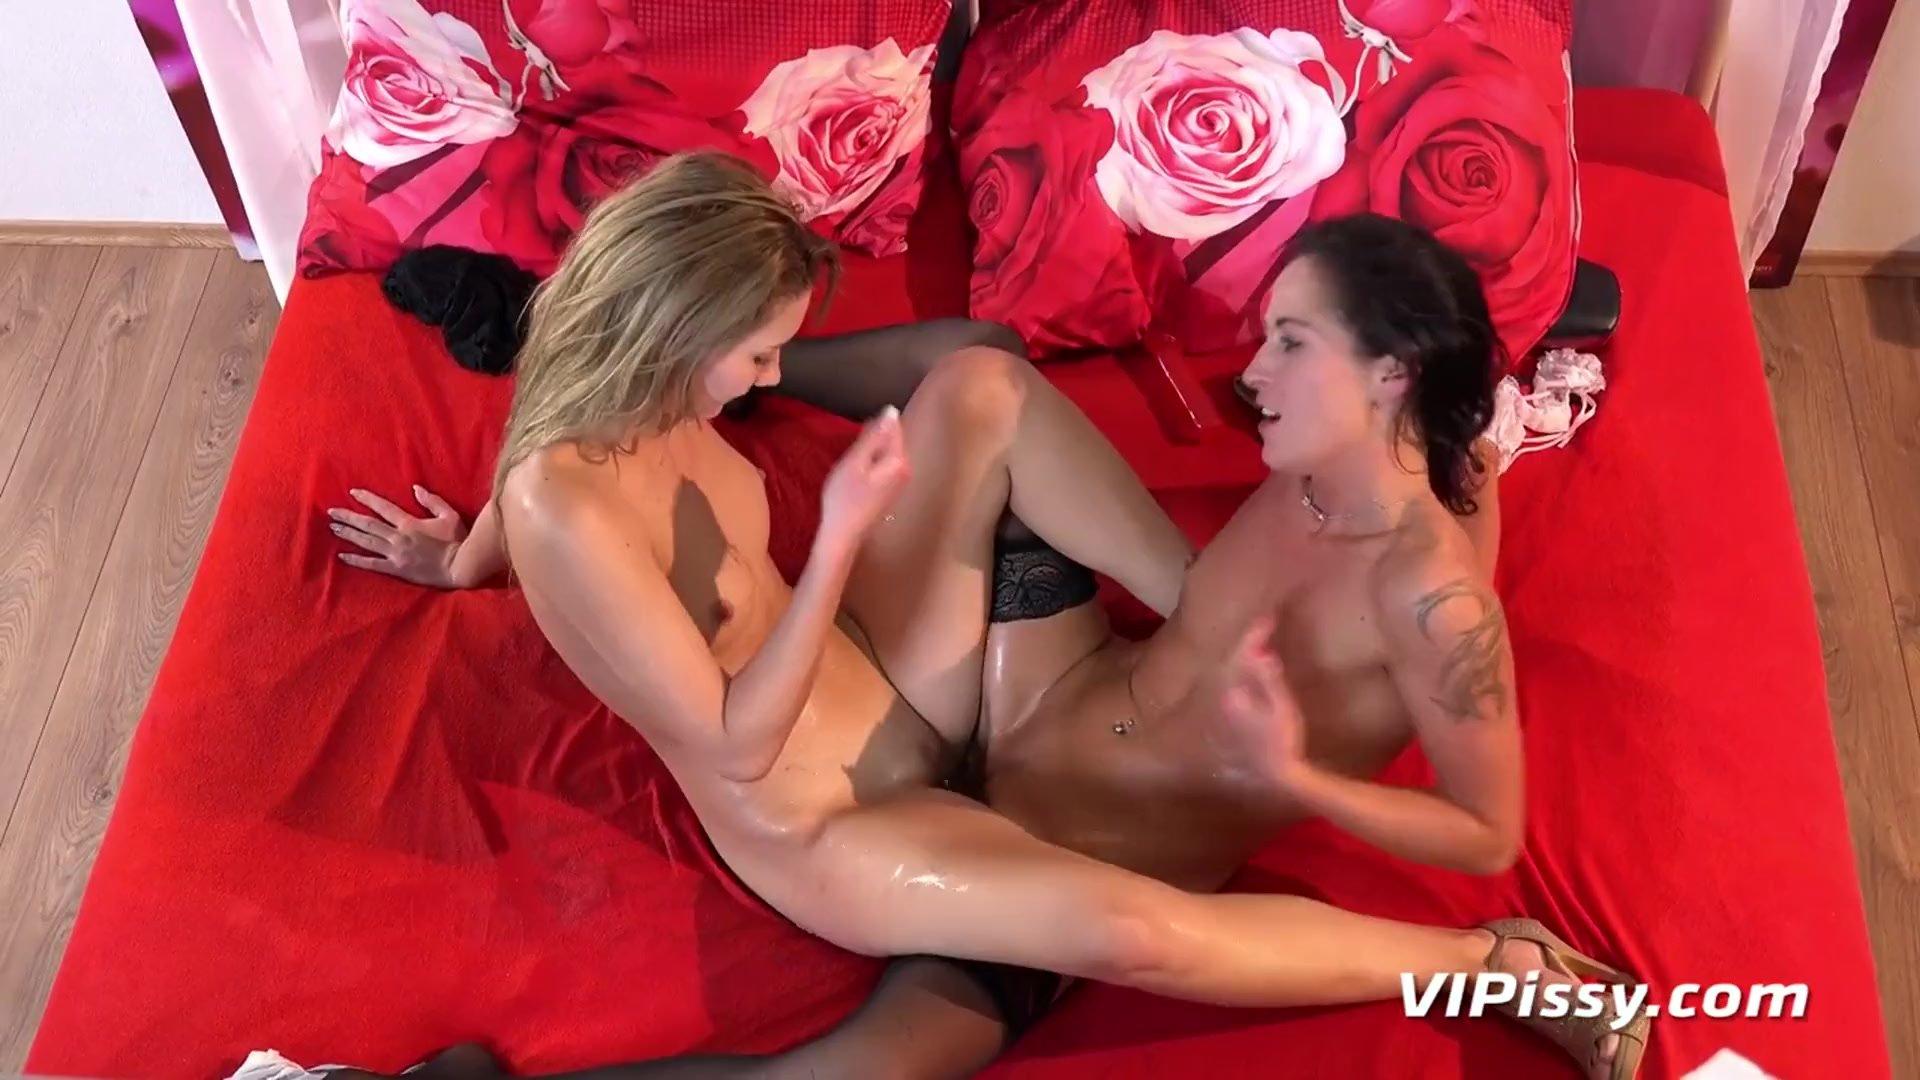 Lesbian Pee - Aika May and Vanessa Twain Piss soaked lesbians